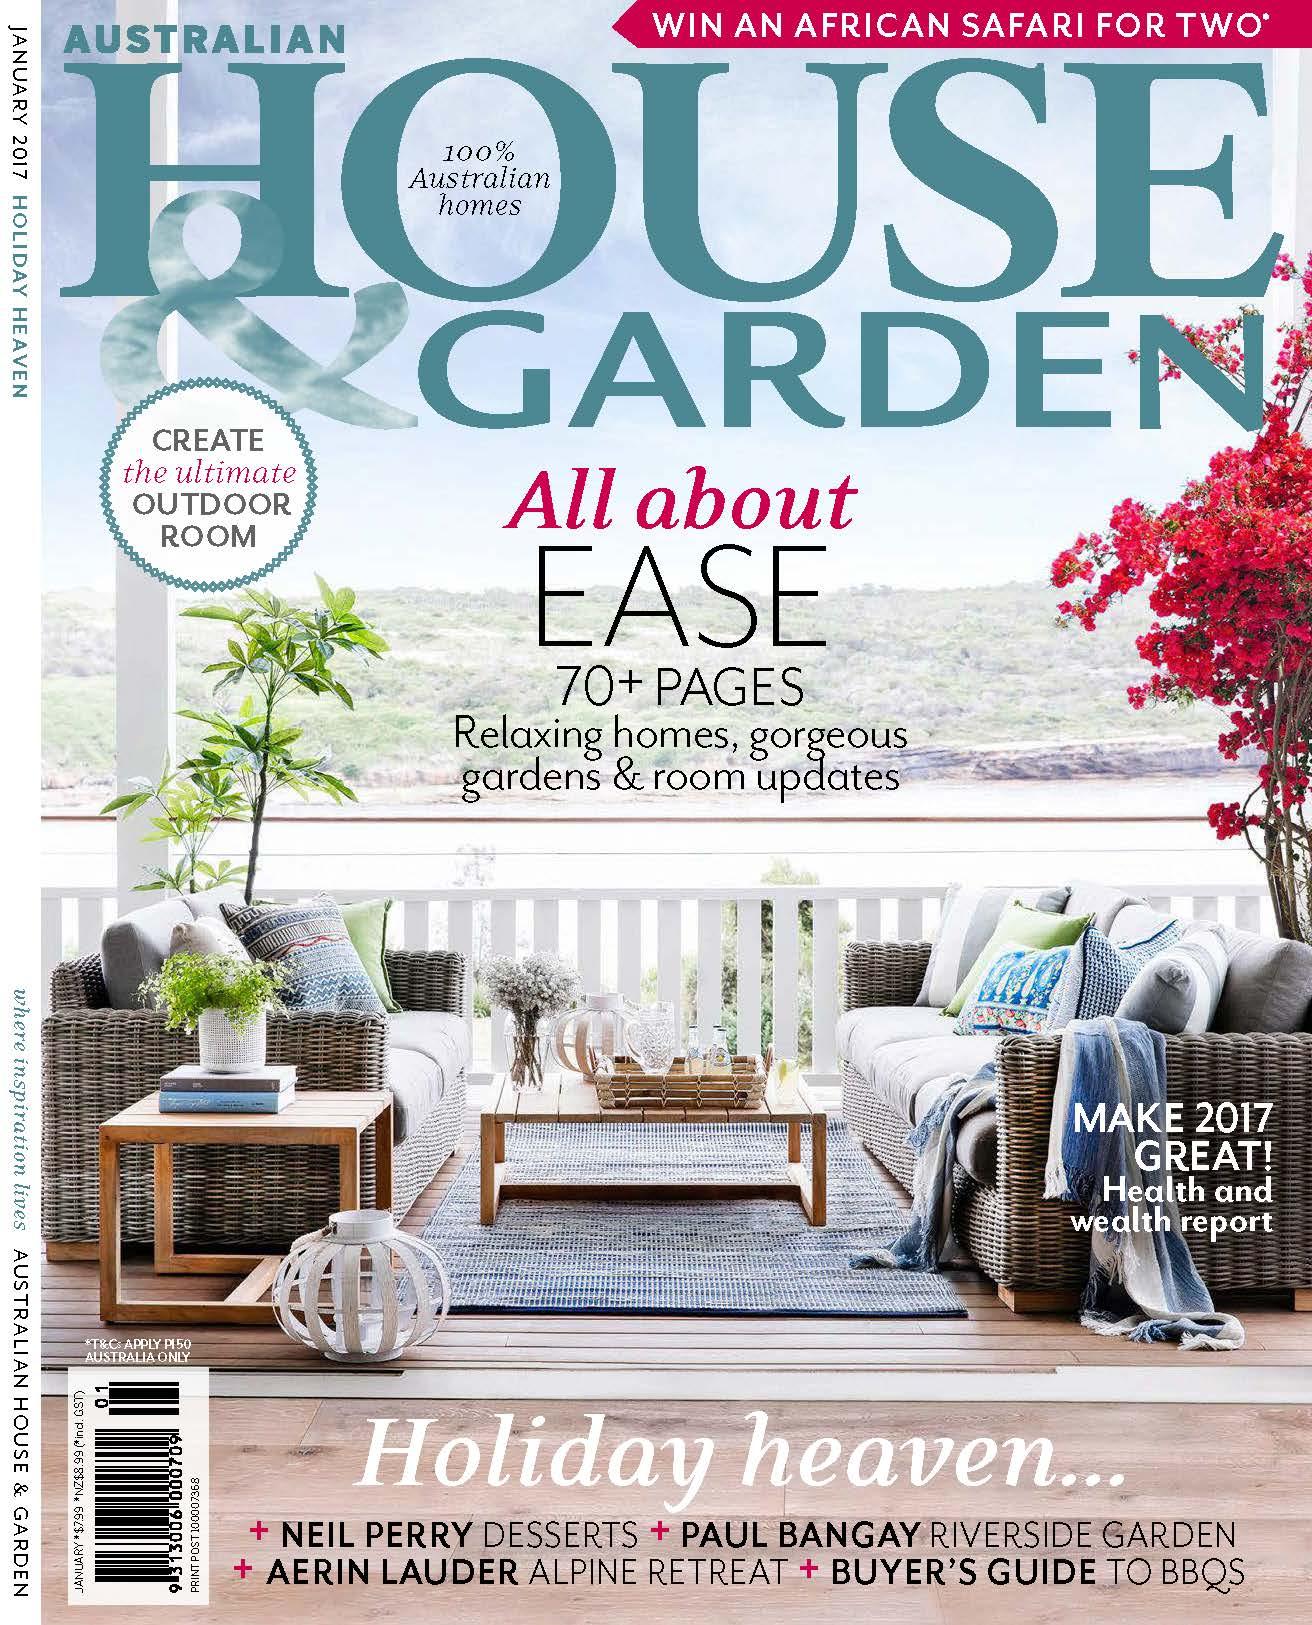 Australian House & Garden - January 2017_Page_001.jpg